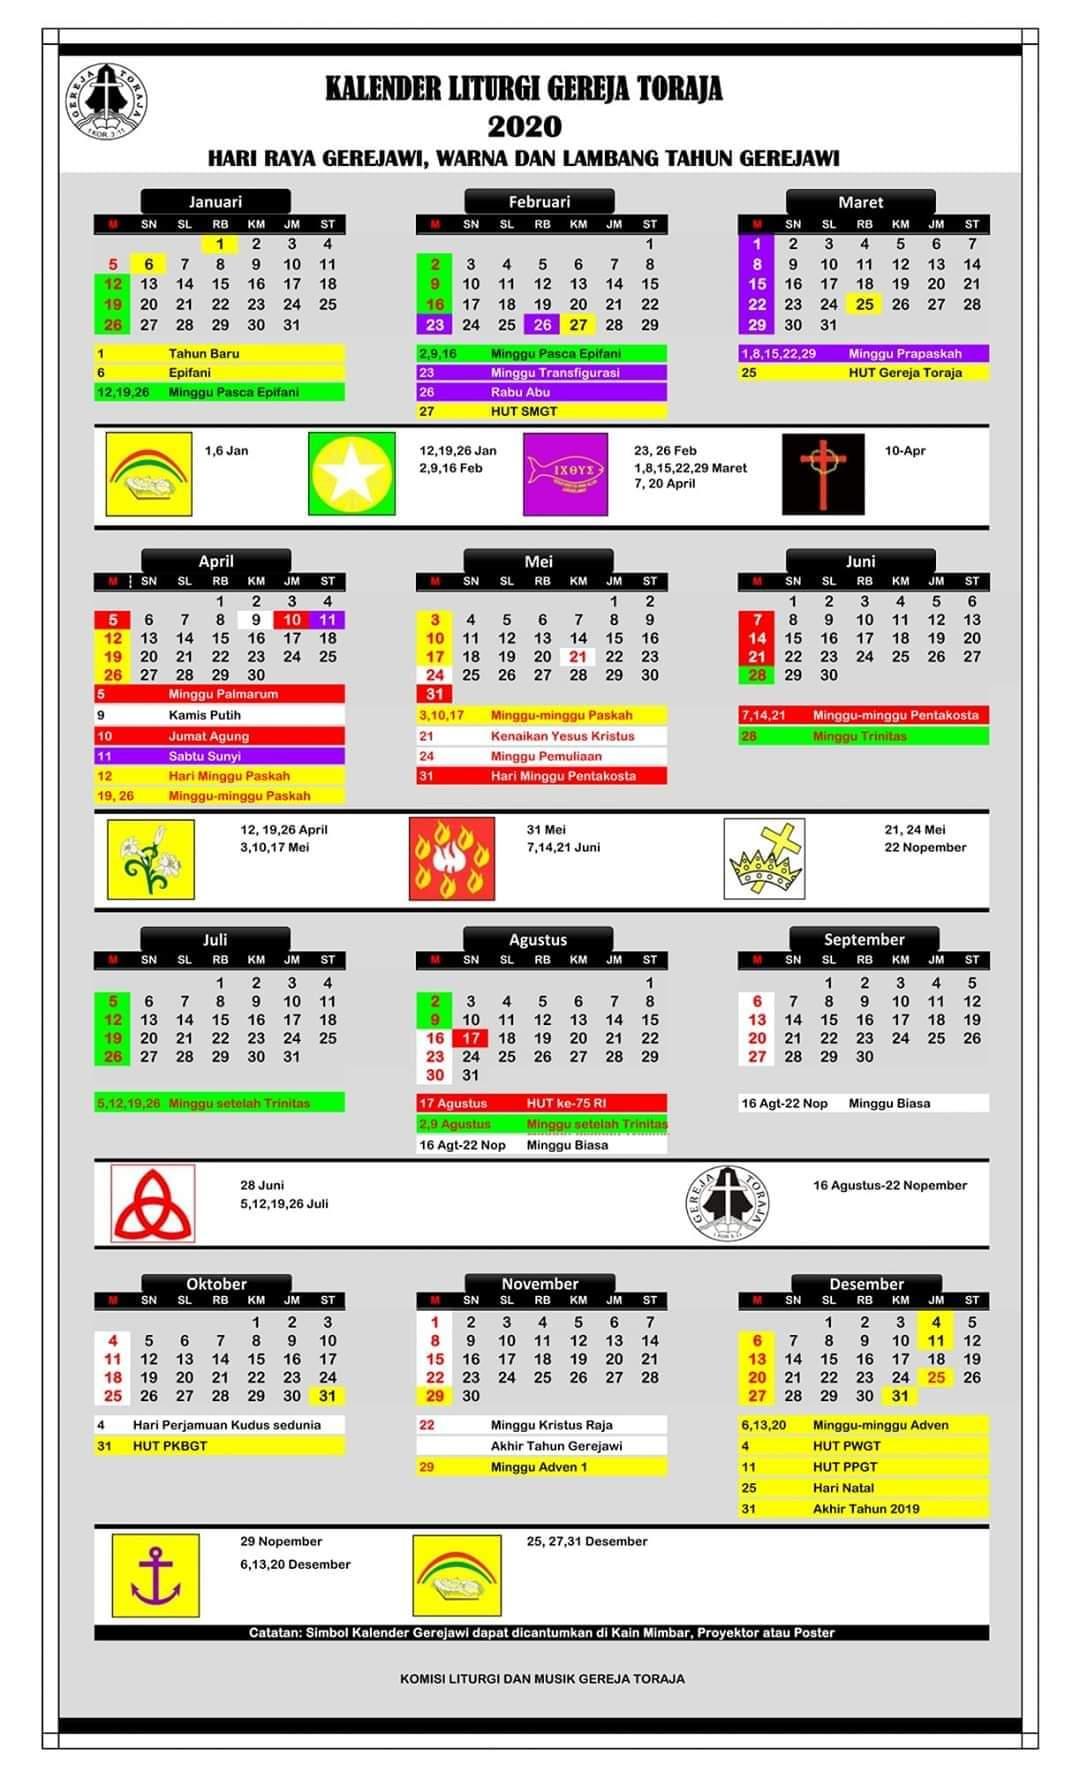 Kalender Liturgi Gereja Toraja 2020